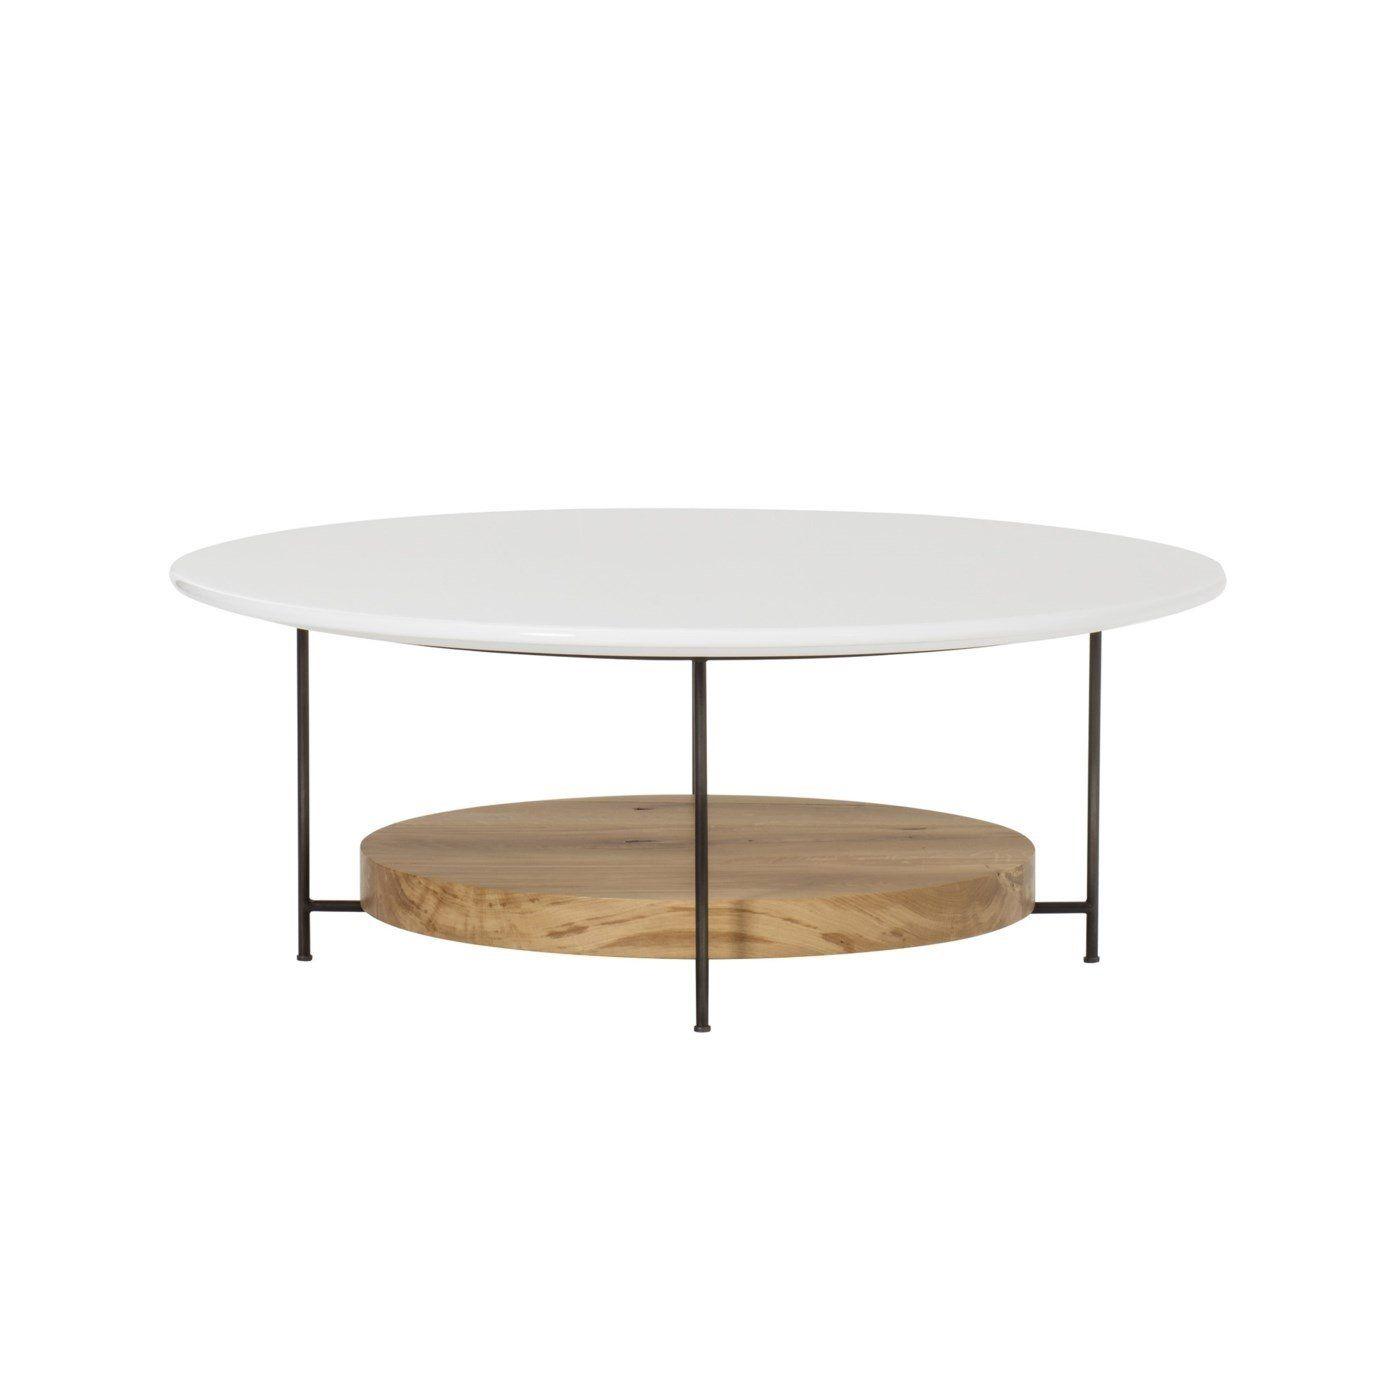 Olivia Round Coffee Table White In 2020 Round Coffee Table Coffee Table White Round Coffee Table [ 1400 x 1400 Pixel ]